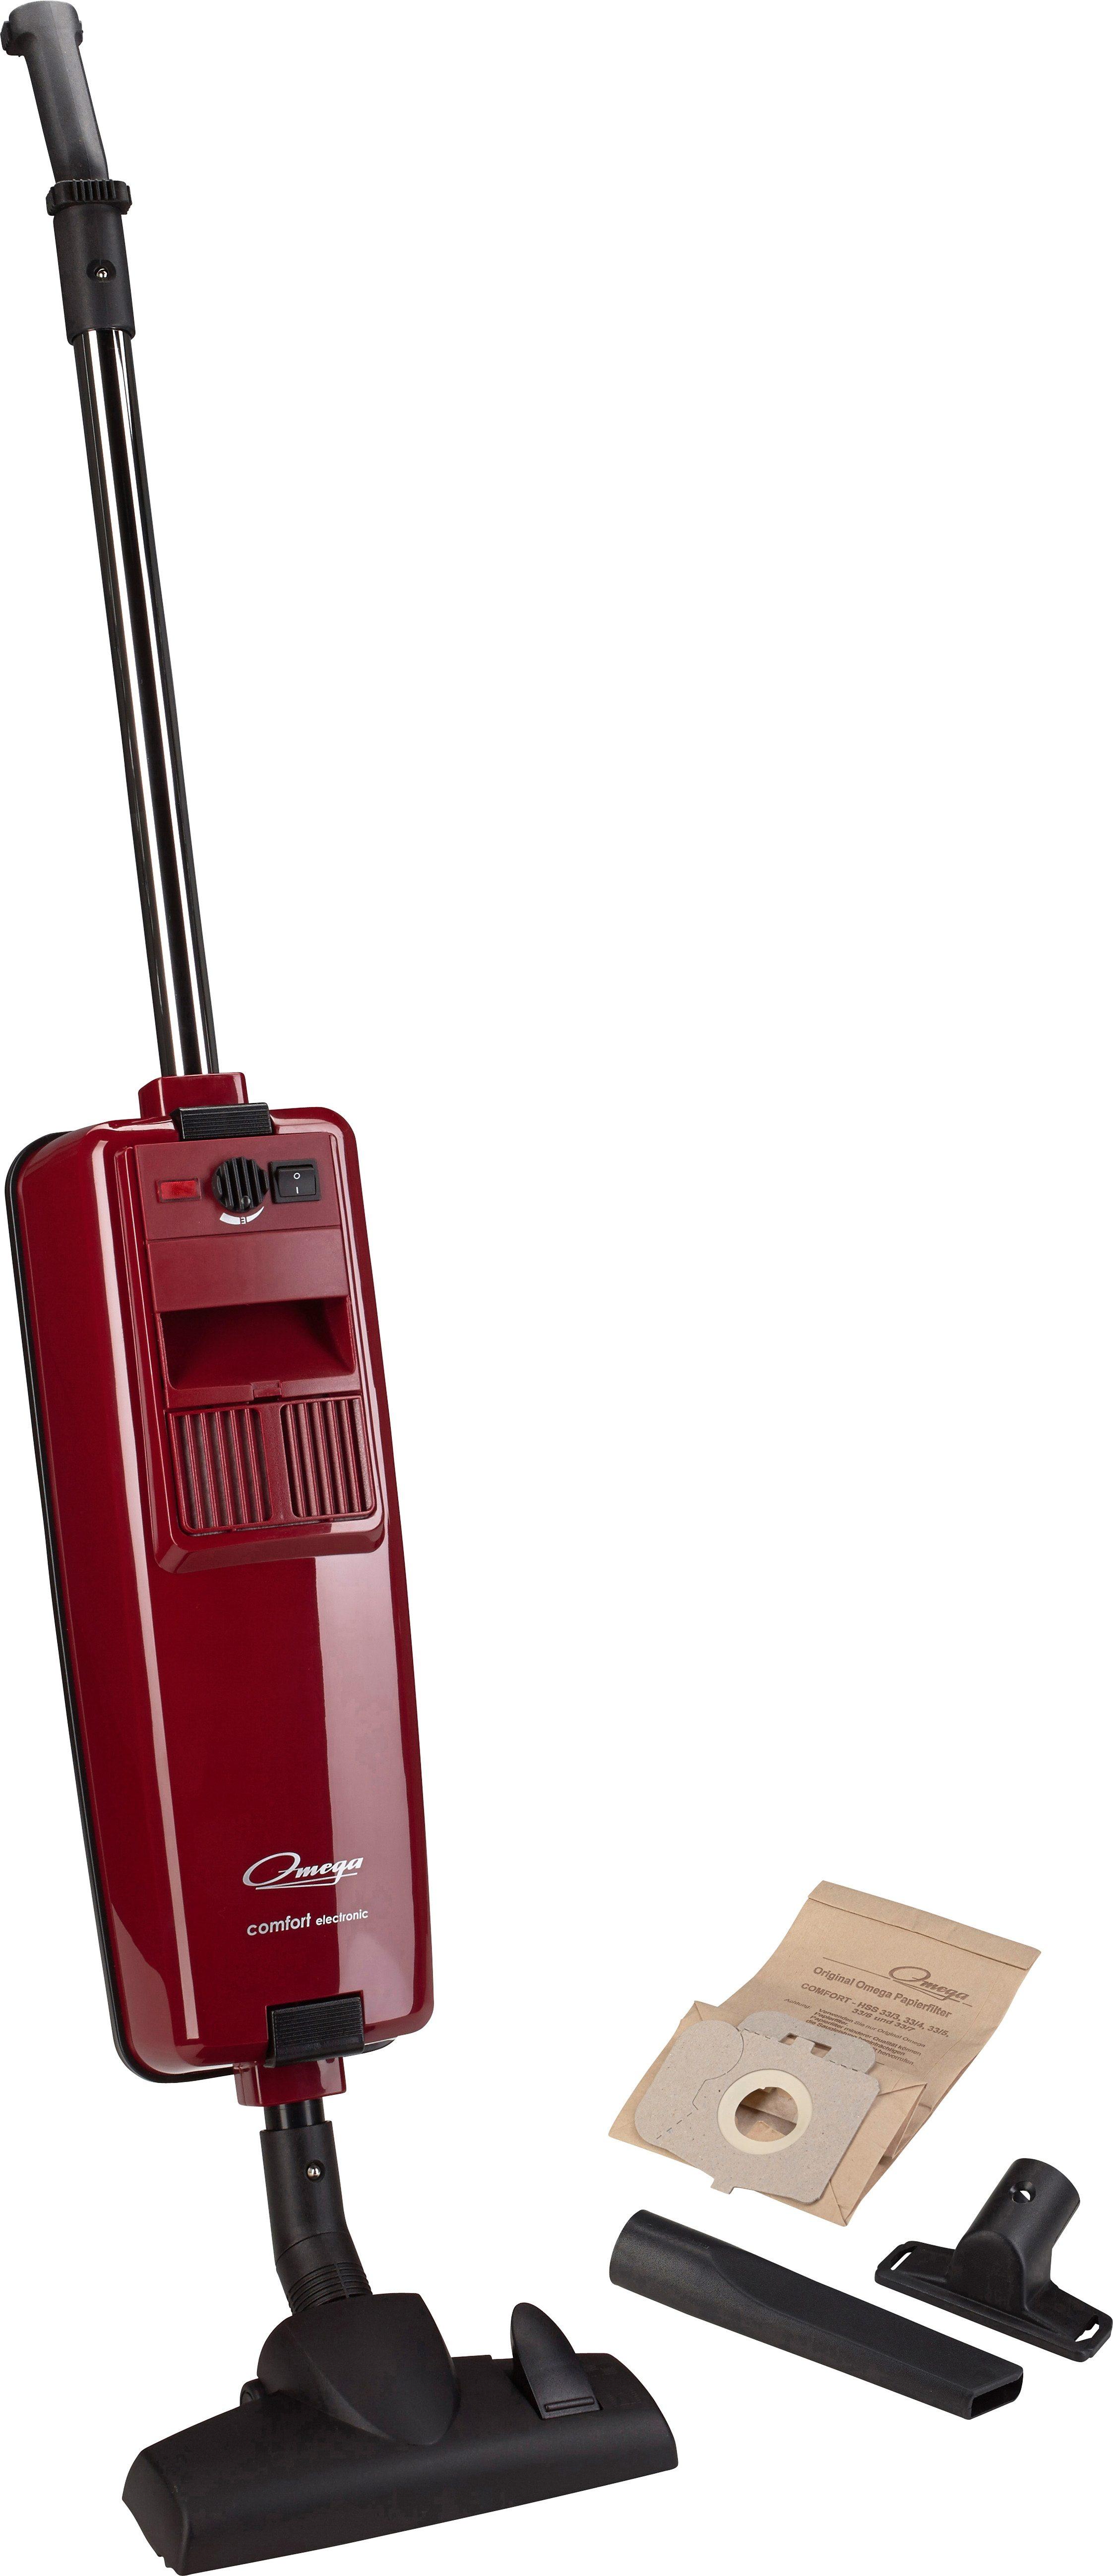 Omega Staubsauger Comfort electronic, C, rubinrot